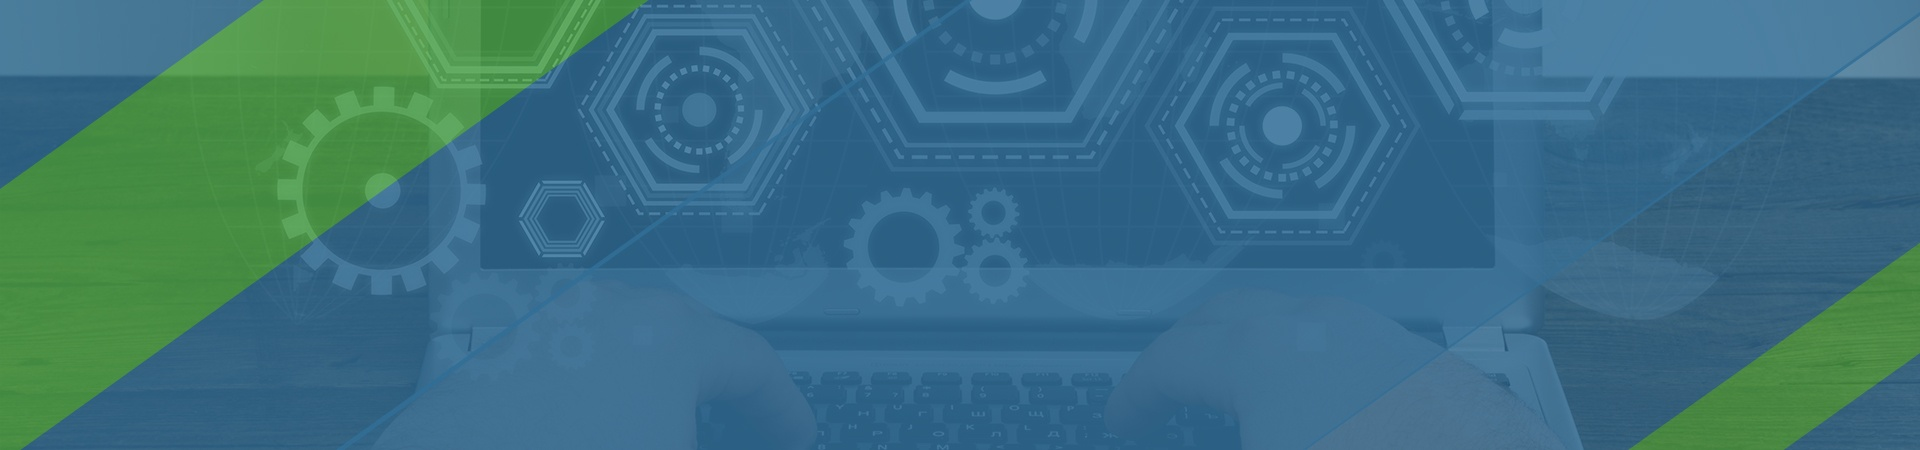 Heade3- Dev10 - Consultant.jpg